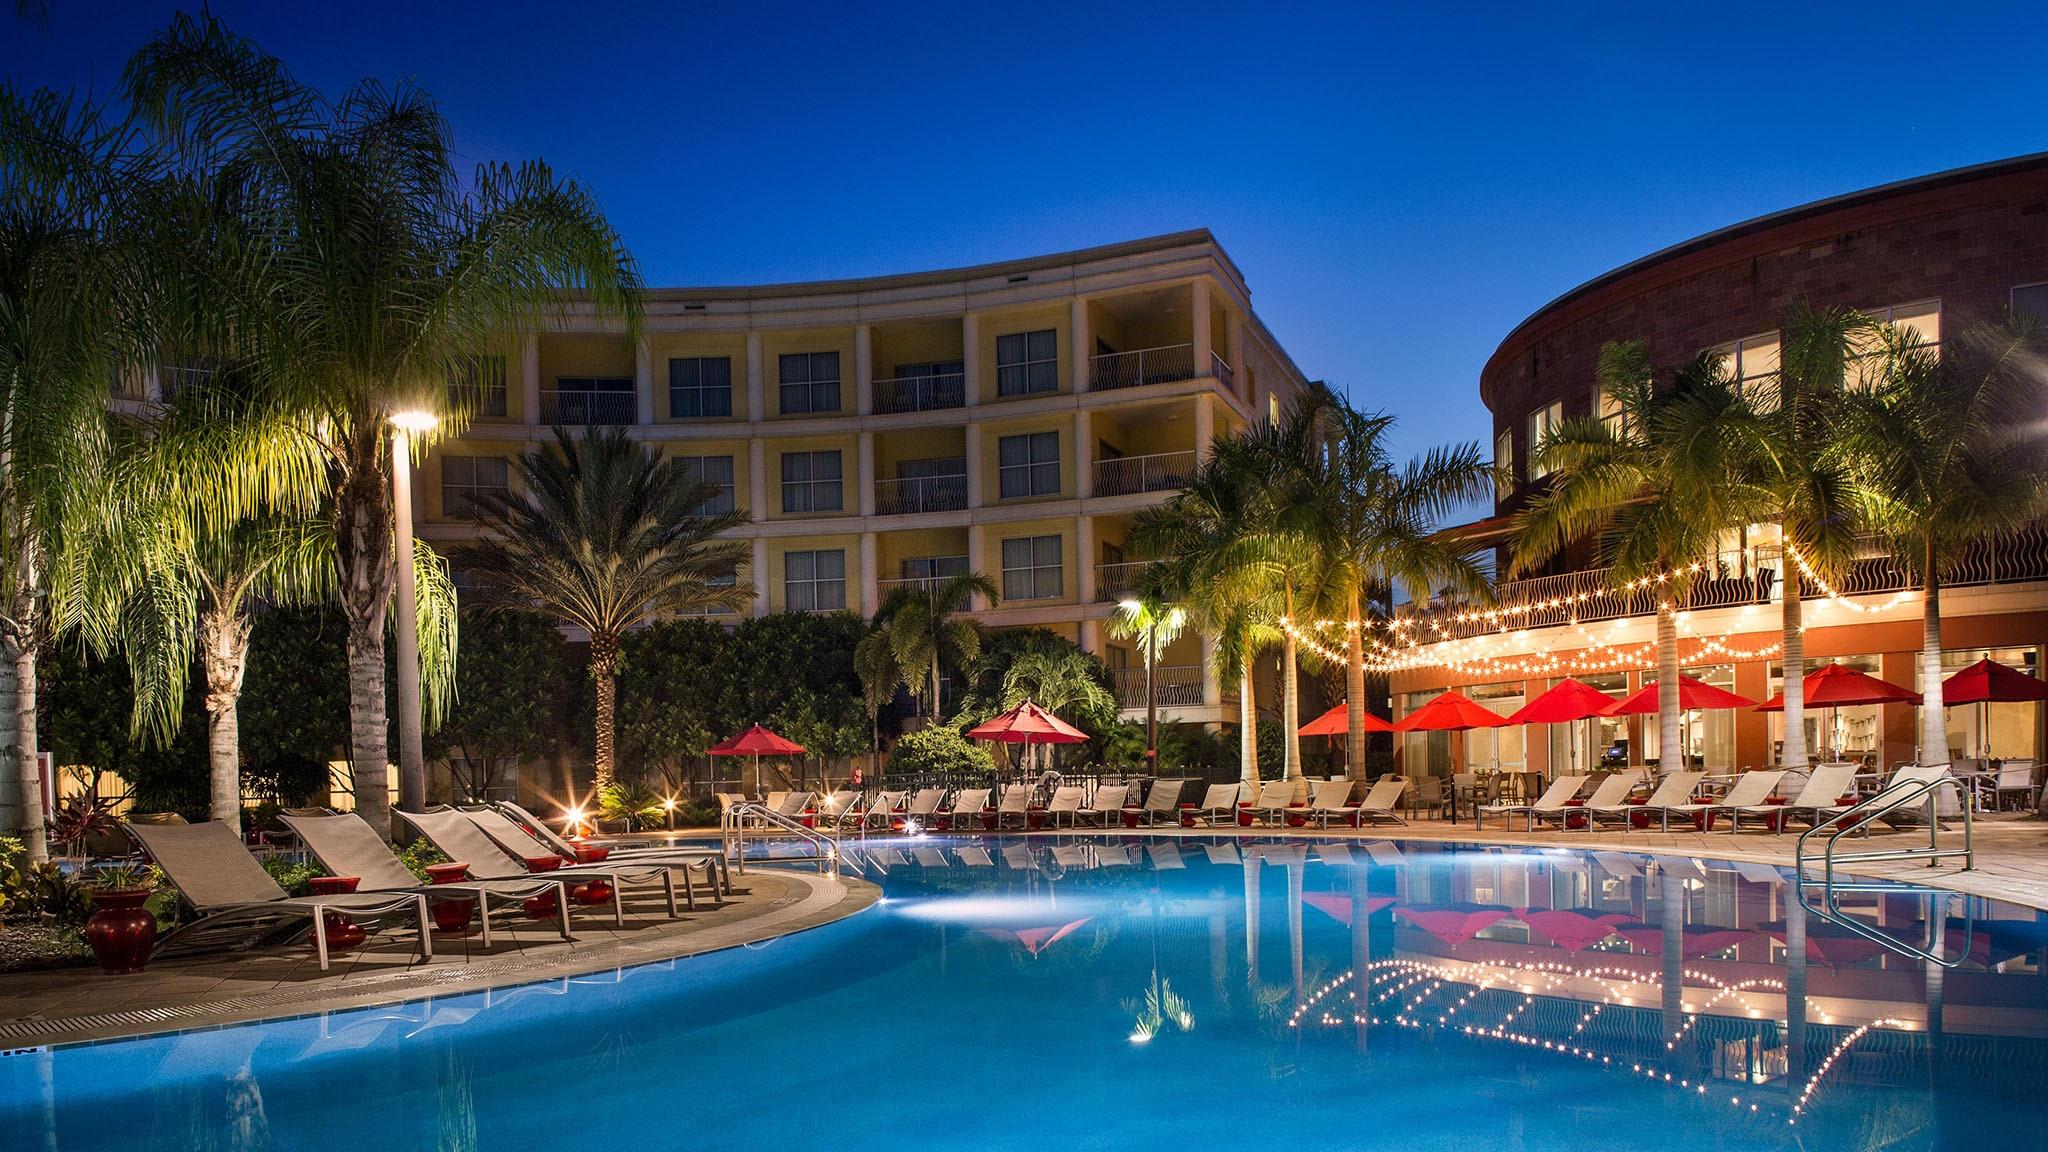 Meli orlando suite hotel for Melia hotel